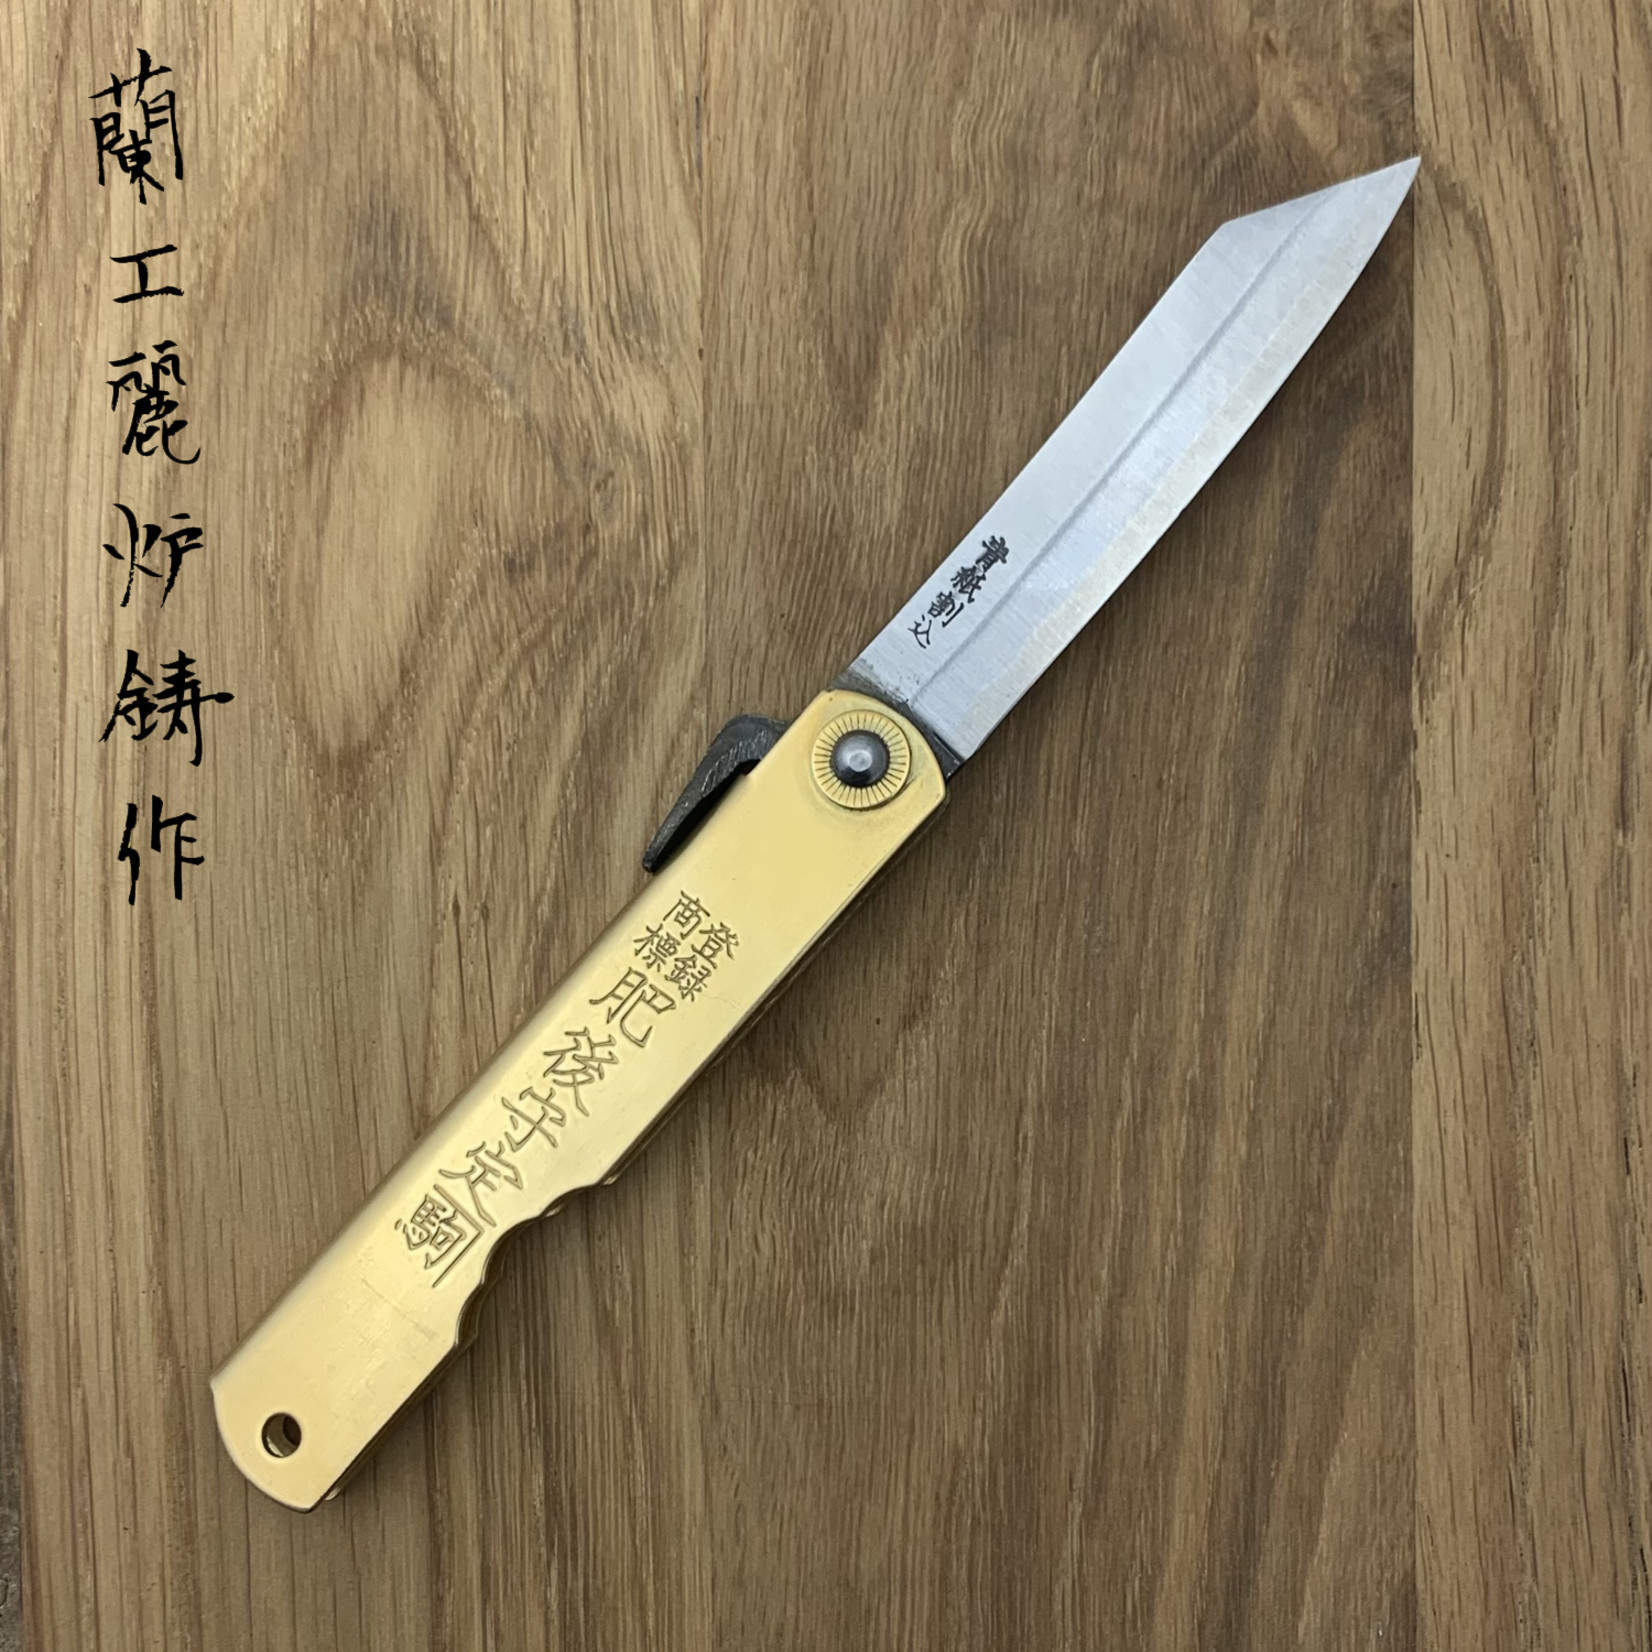 Higonokami Blue steel Core 75 mm Gold 14GD